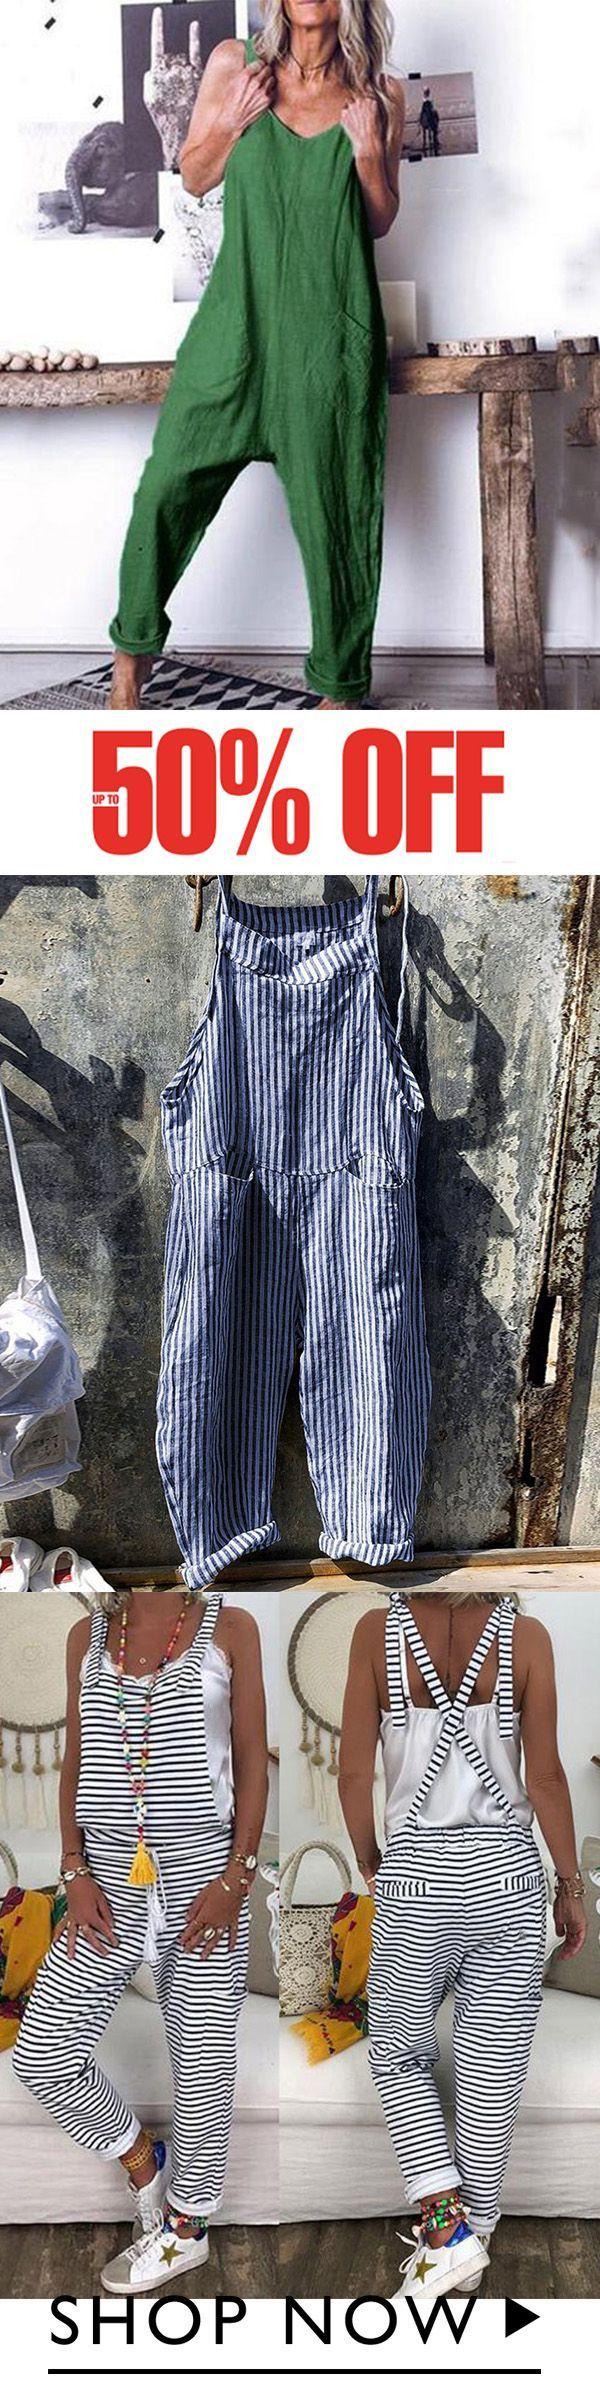 Photo of Mono a rayas con correa Pantalones anchos – Tuta – #anchos #con #correa #J …